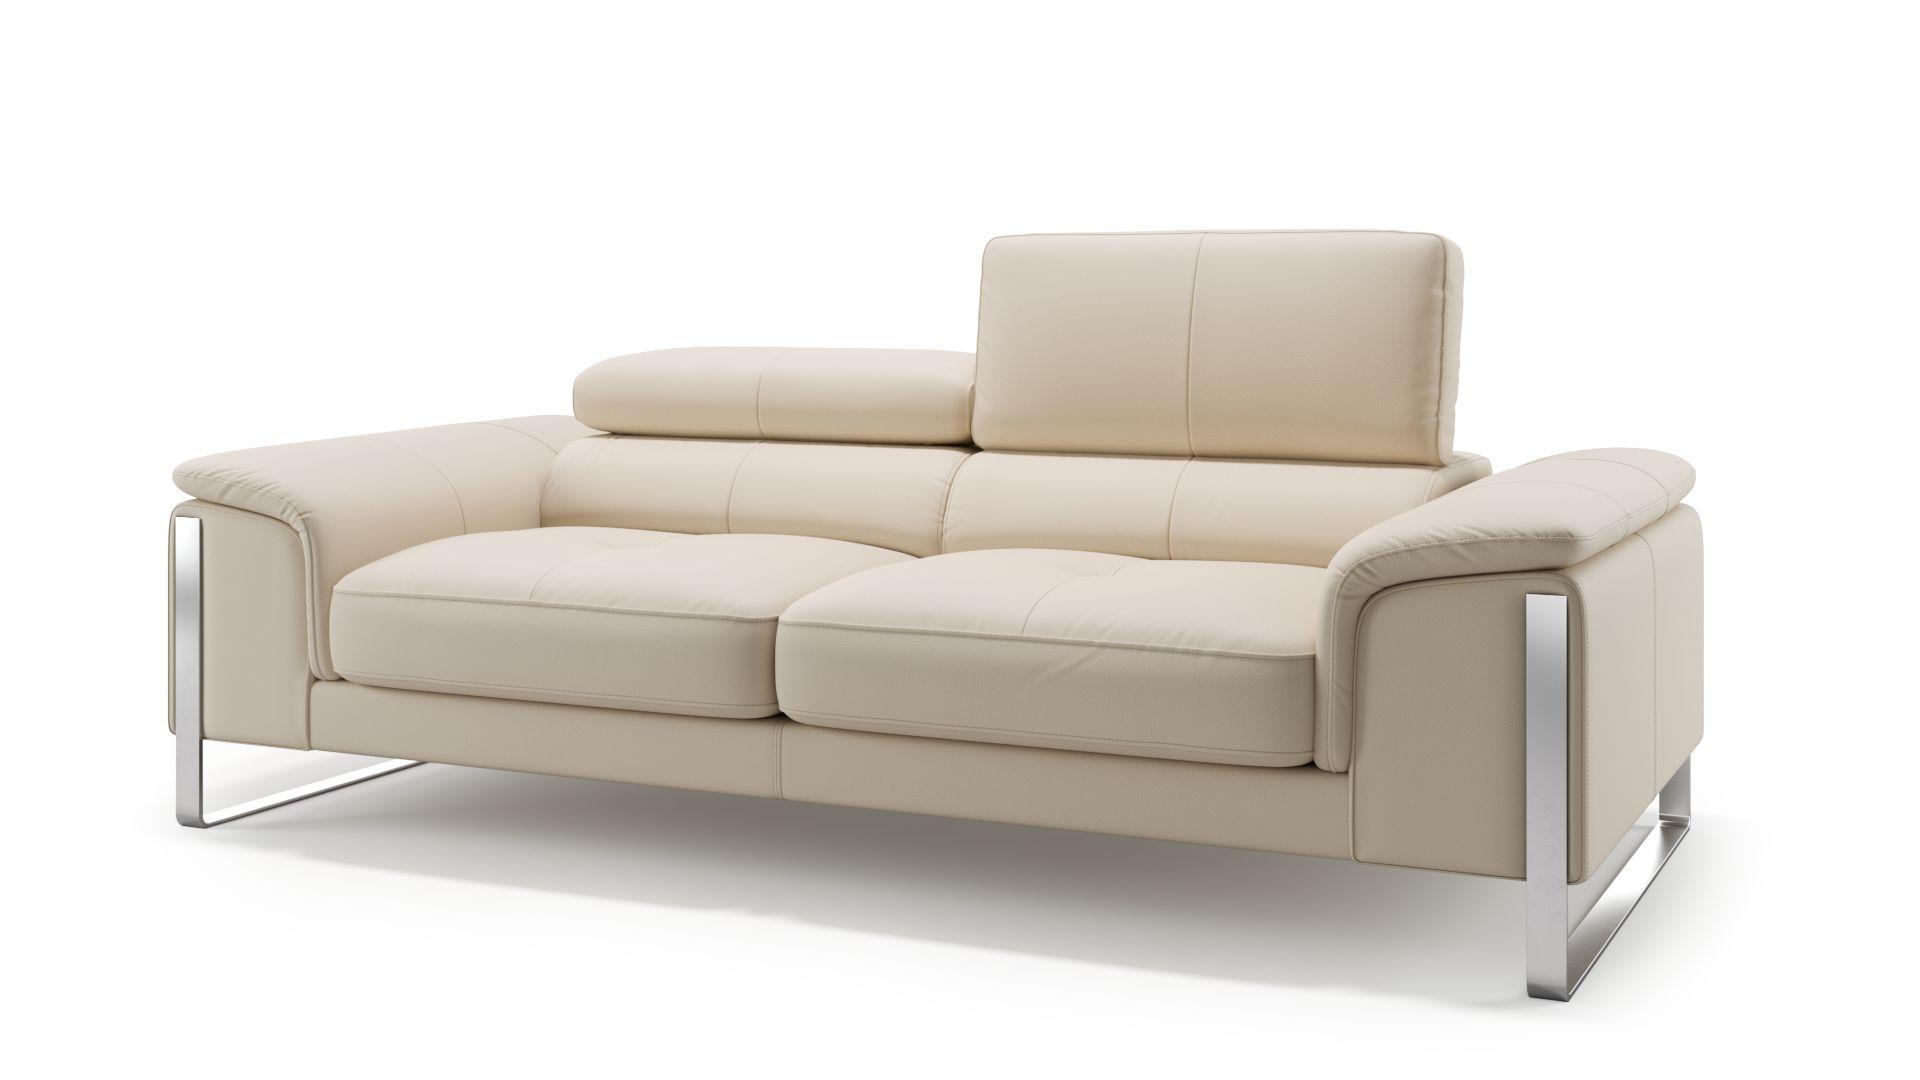 Leder 3-Sitzer Sofa PIZZOLI